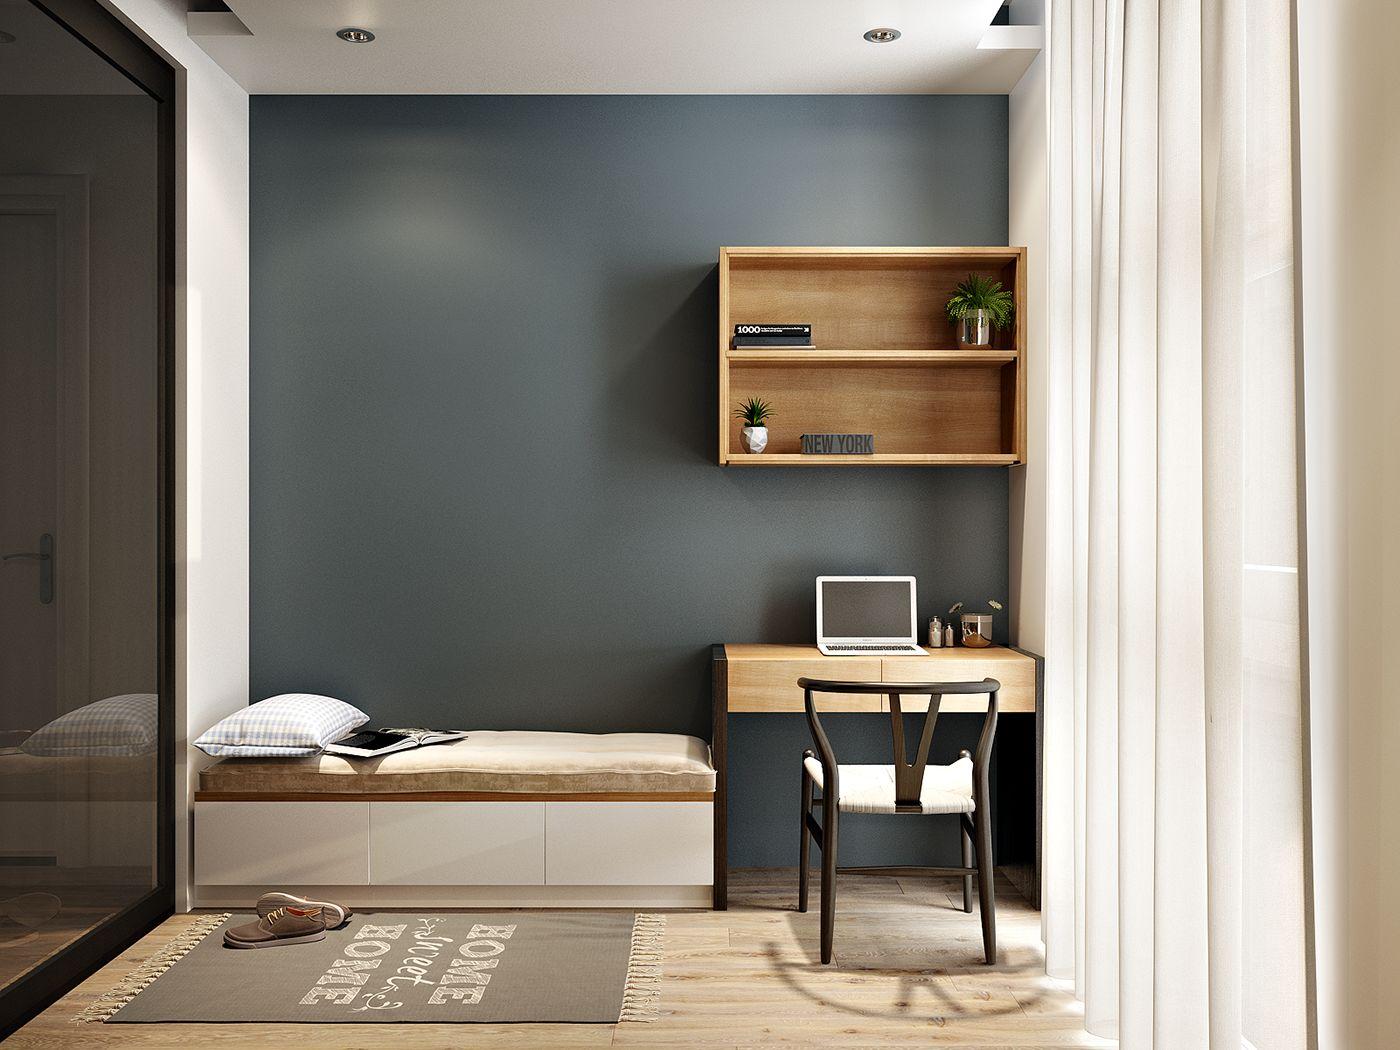 Sophisticated Small Bedroom Designs on Bedroom Ideas Small Room  id=46804